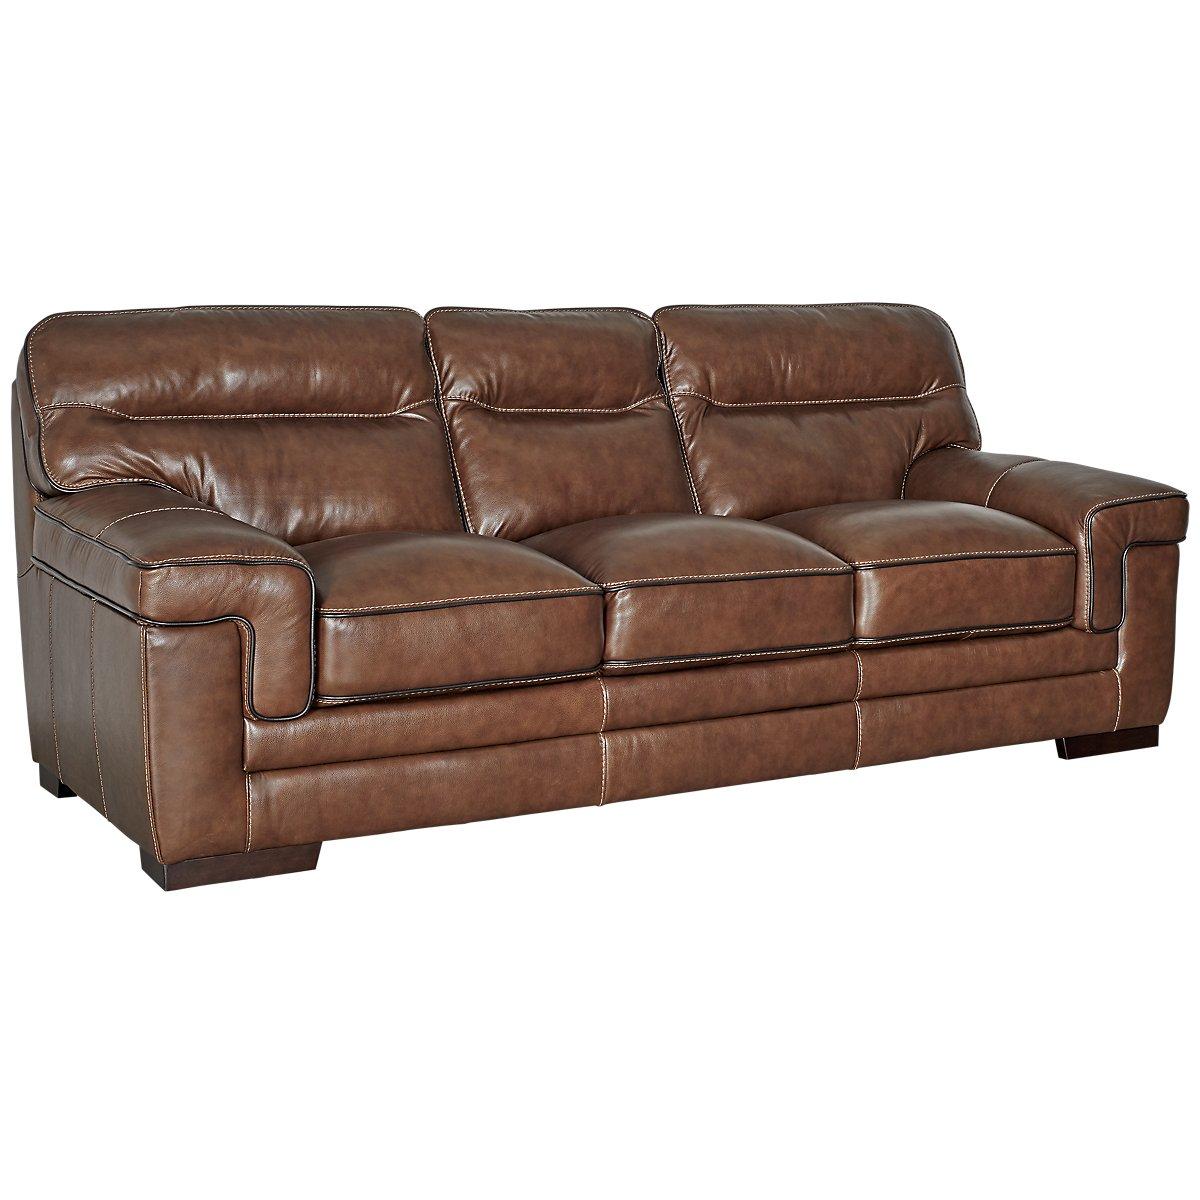 Alexander Medium Brown Leather Sofa View Larger